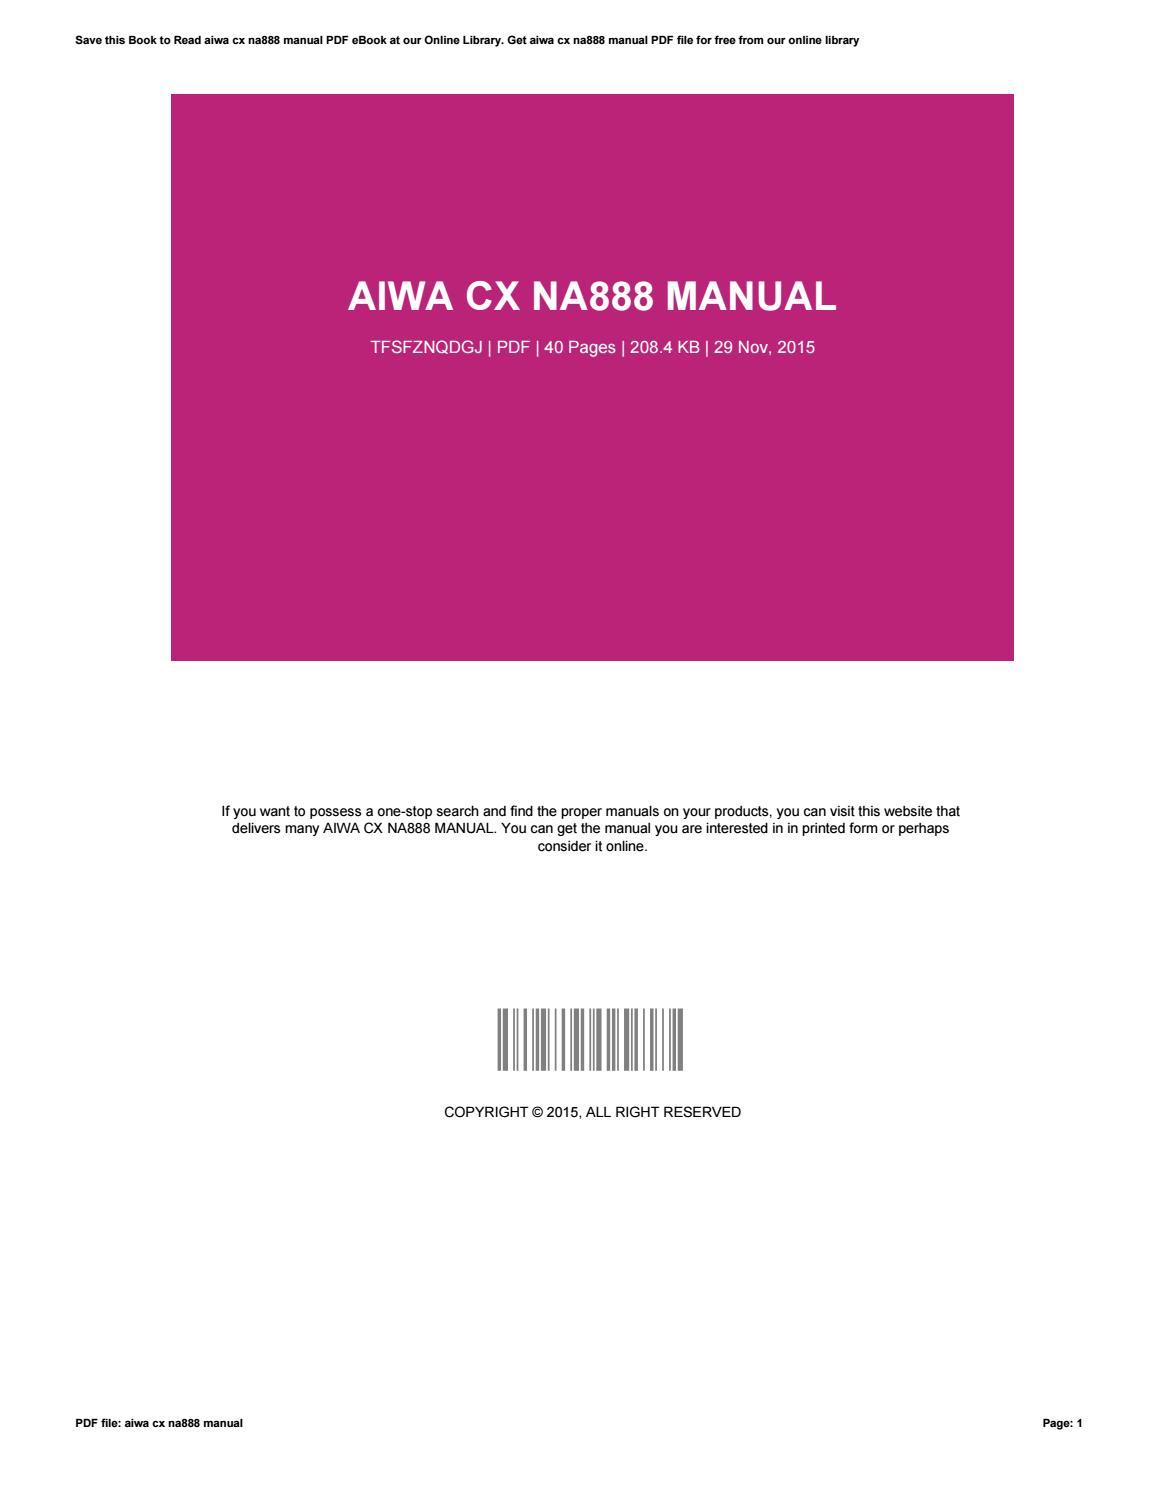 aiwa cx na888 manual by ryanlozano3384 issuu rh issuu com